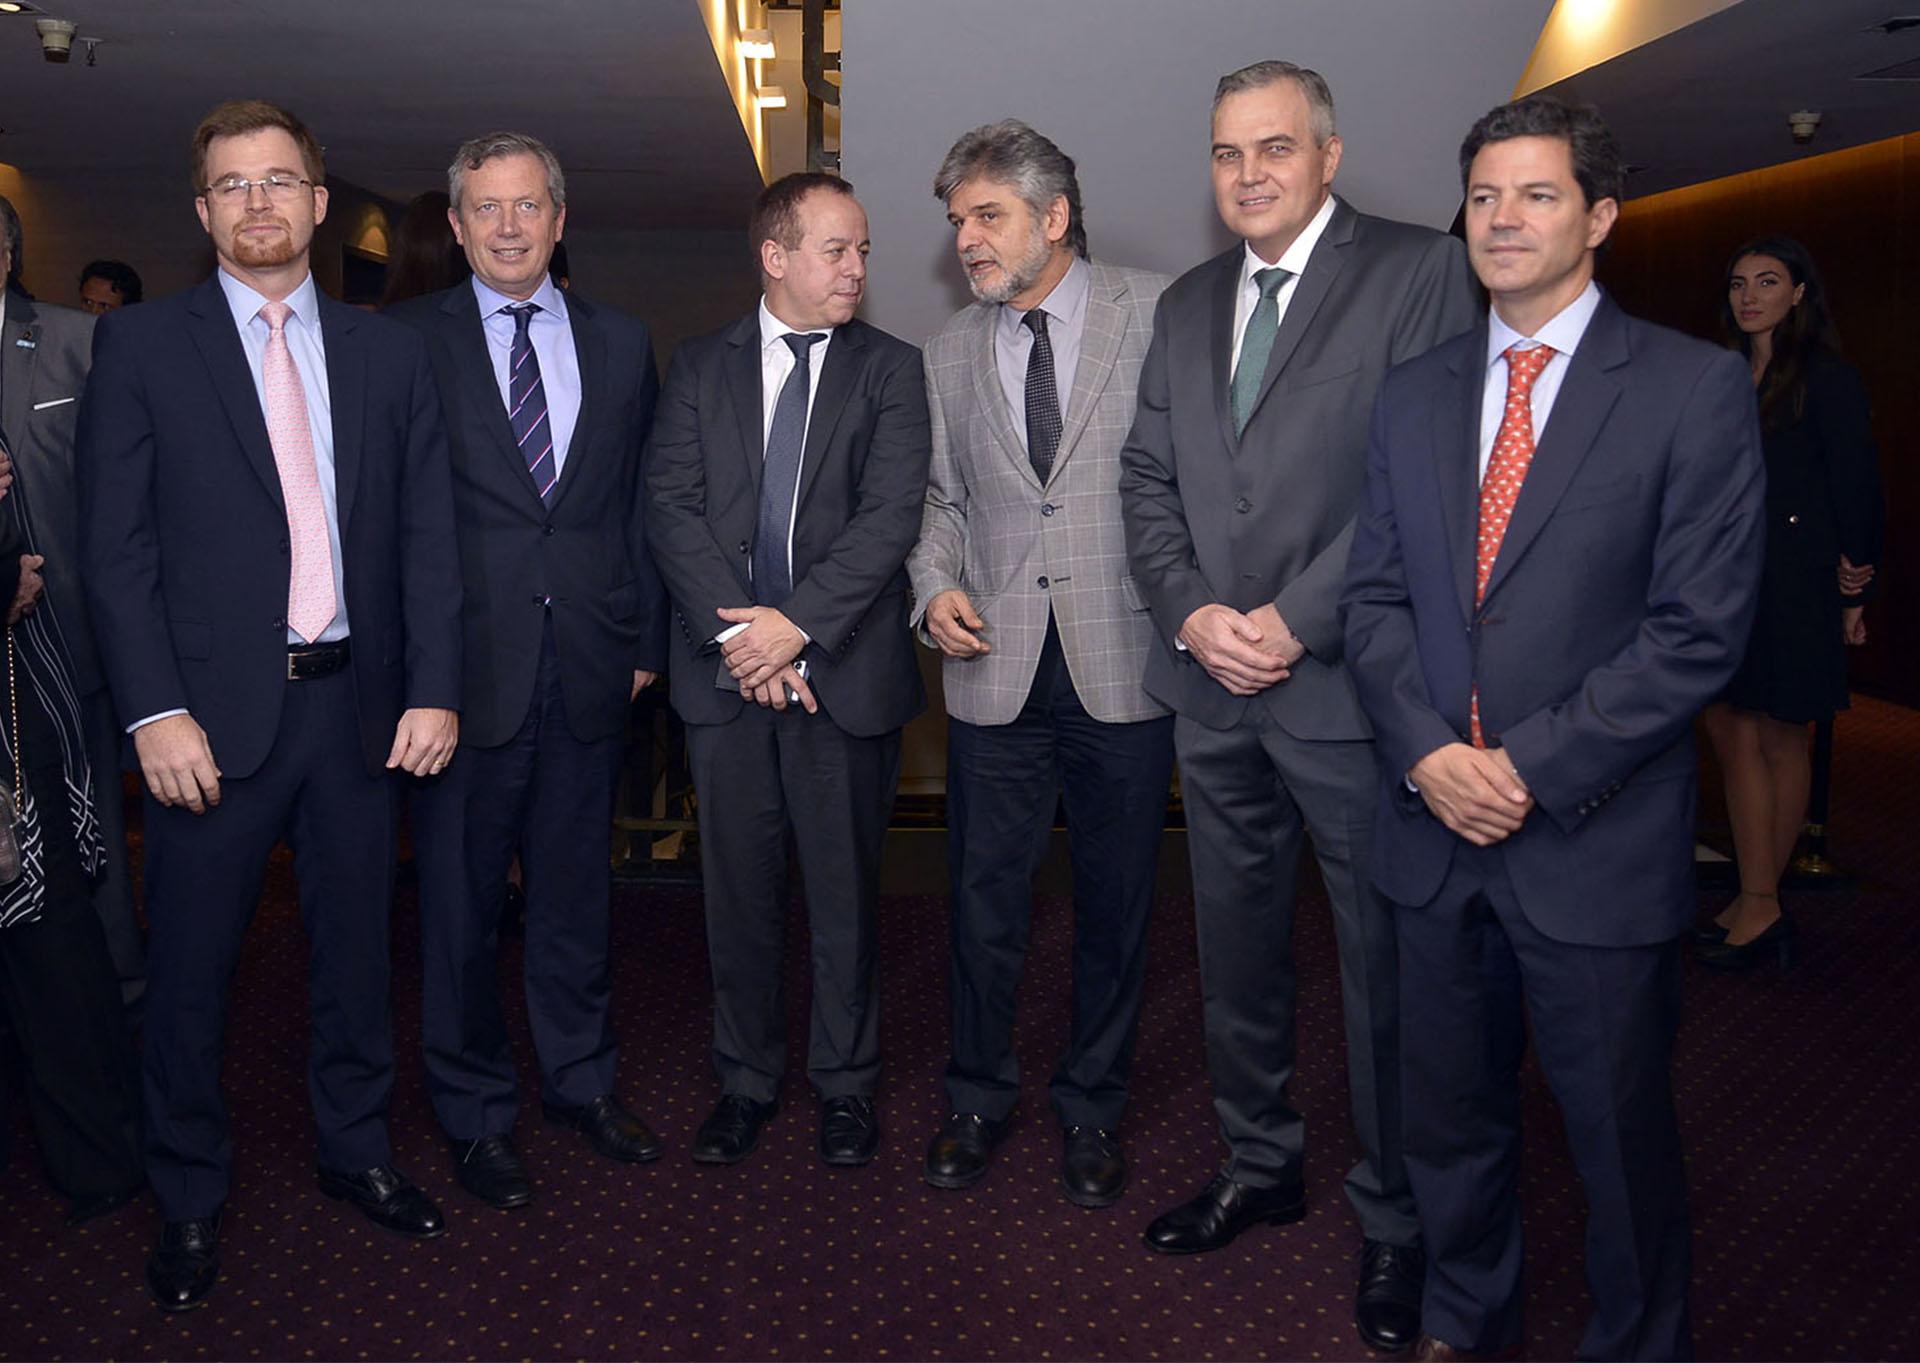 Nicolás Massot; Emilio Monzó; Martín Etchevers; Daniel Filmus; Gustavo Ick; Luciano Laspina